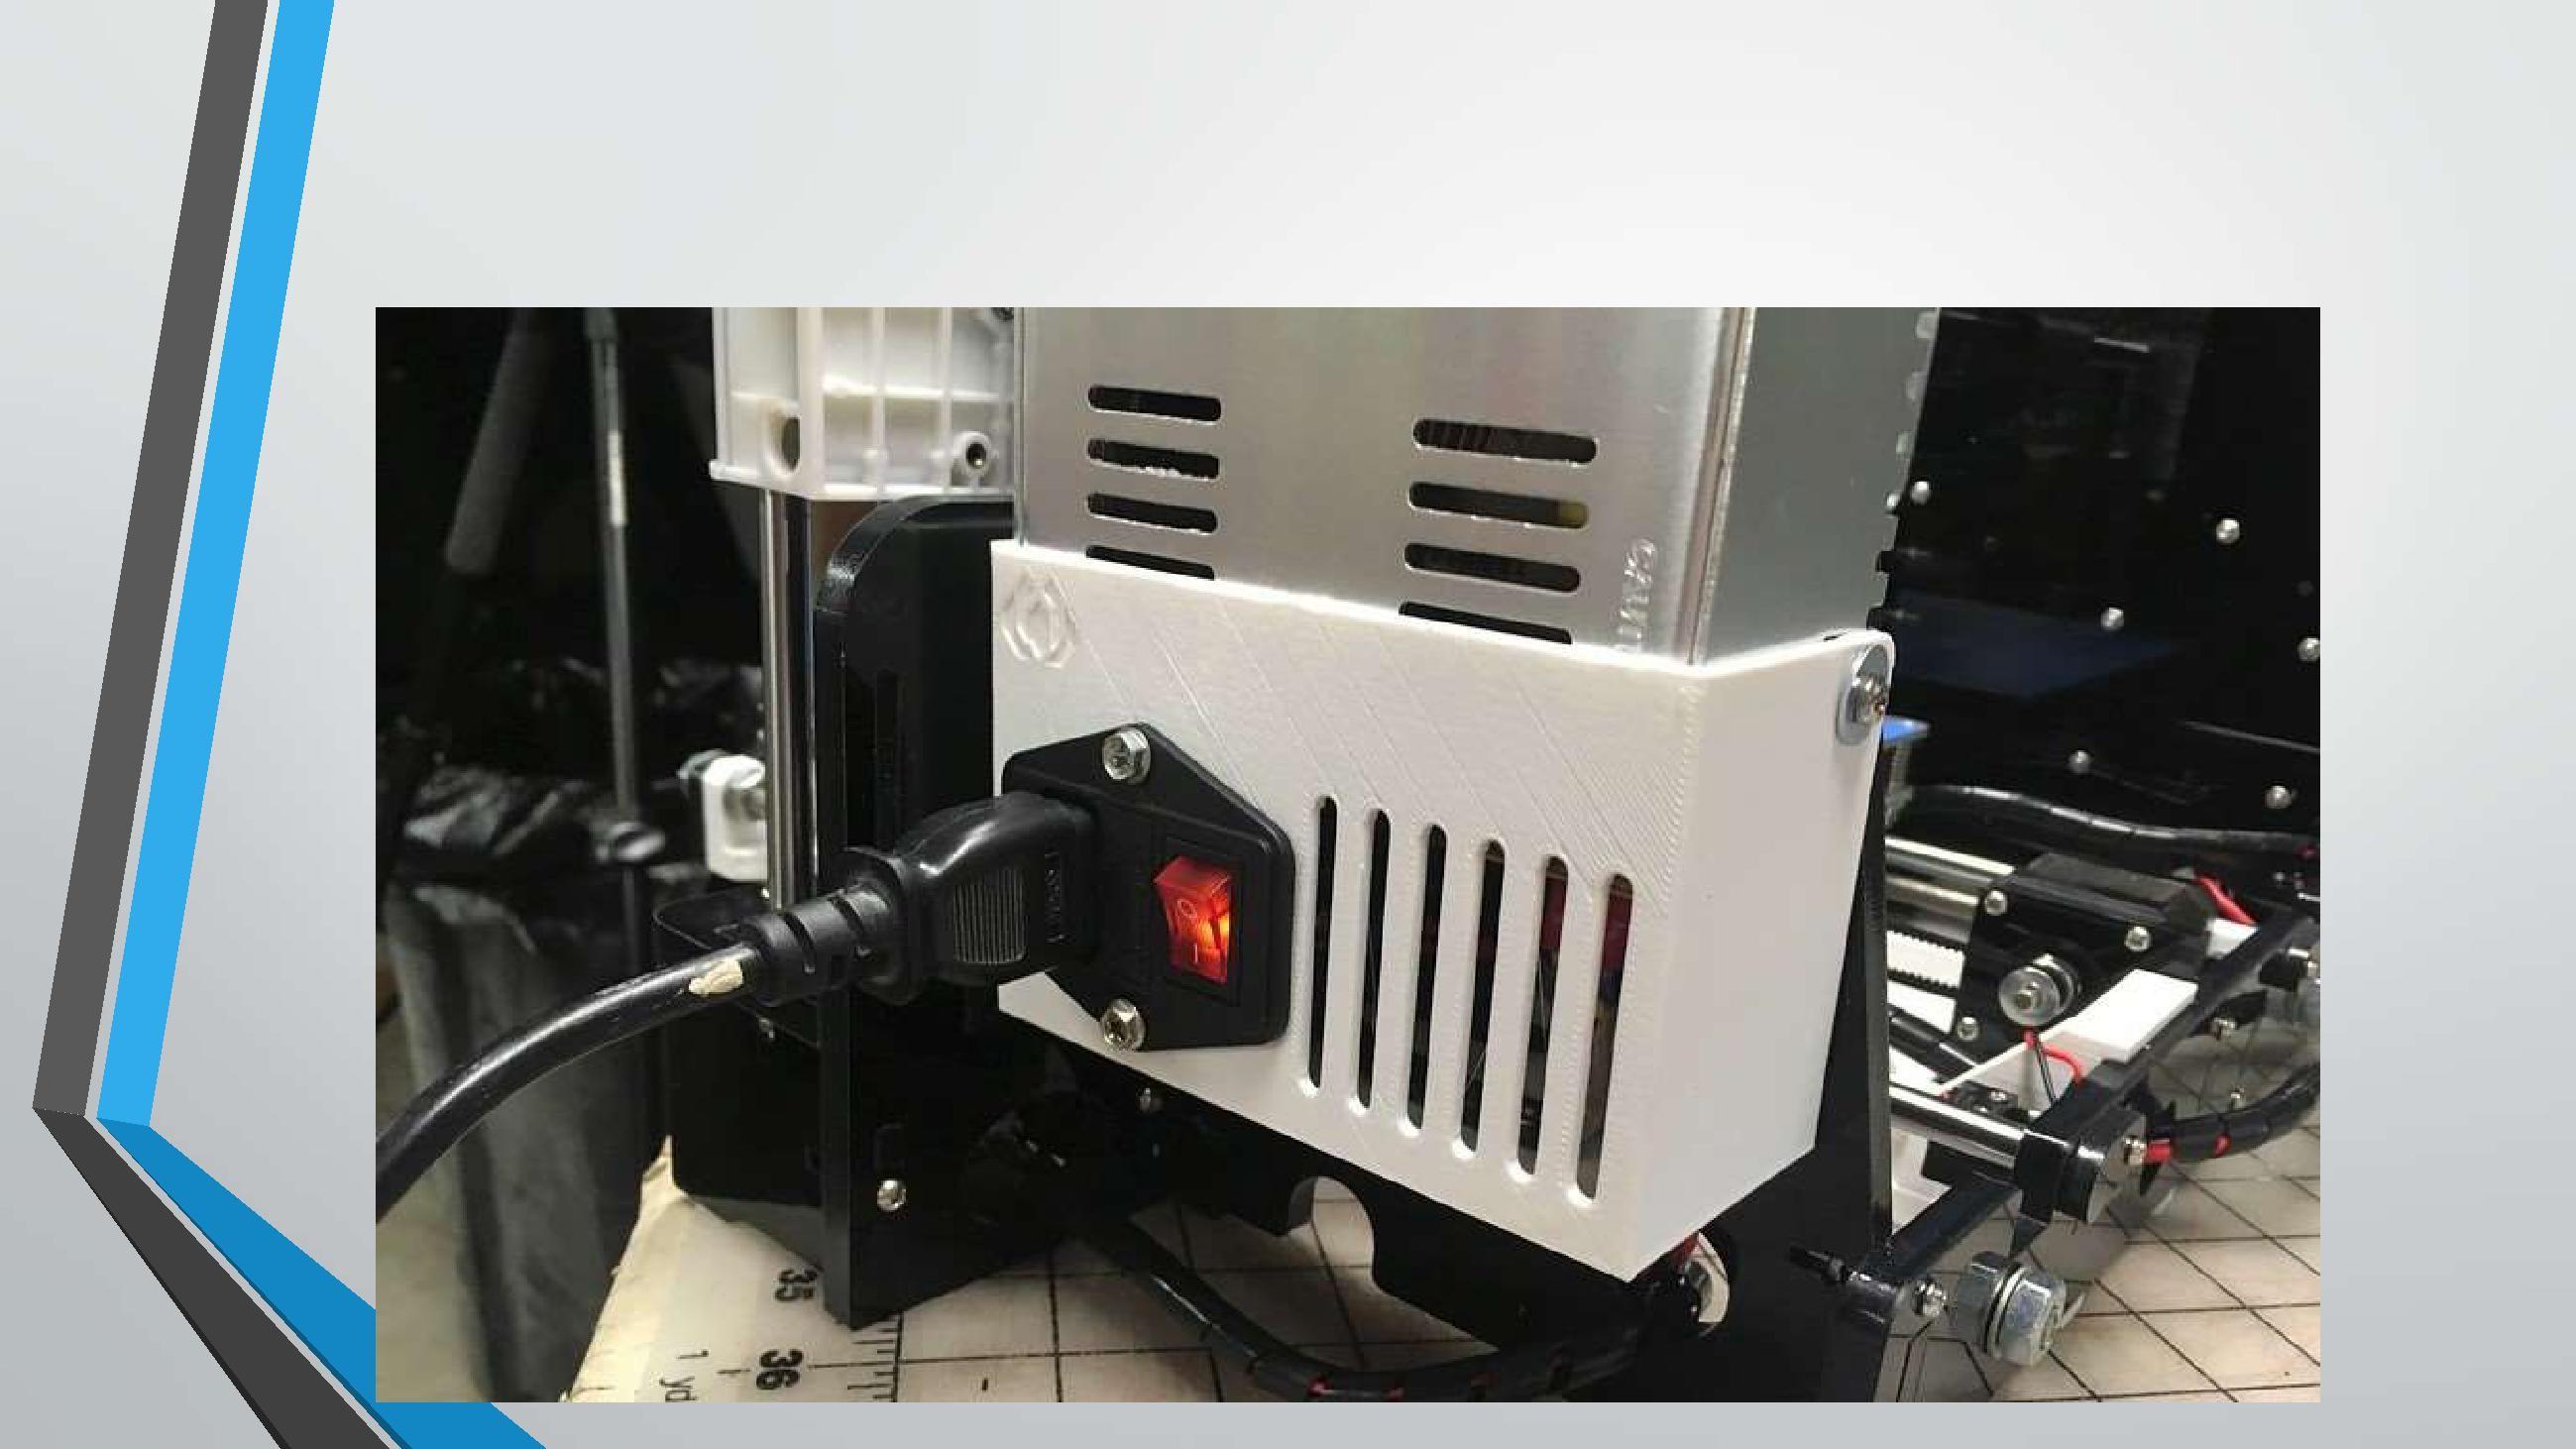 3D printer power supply